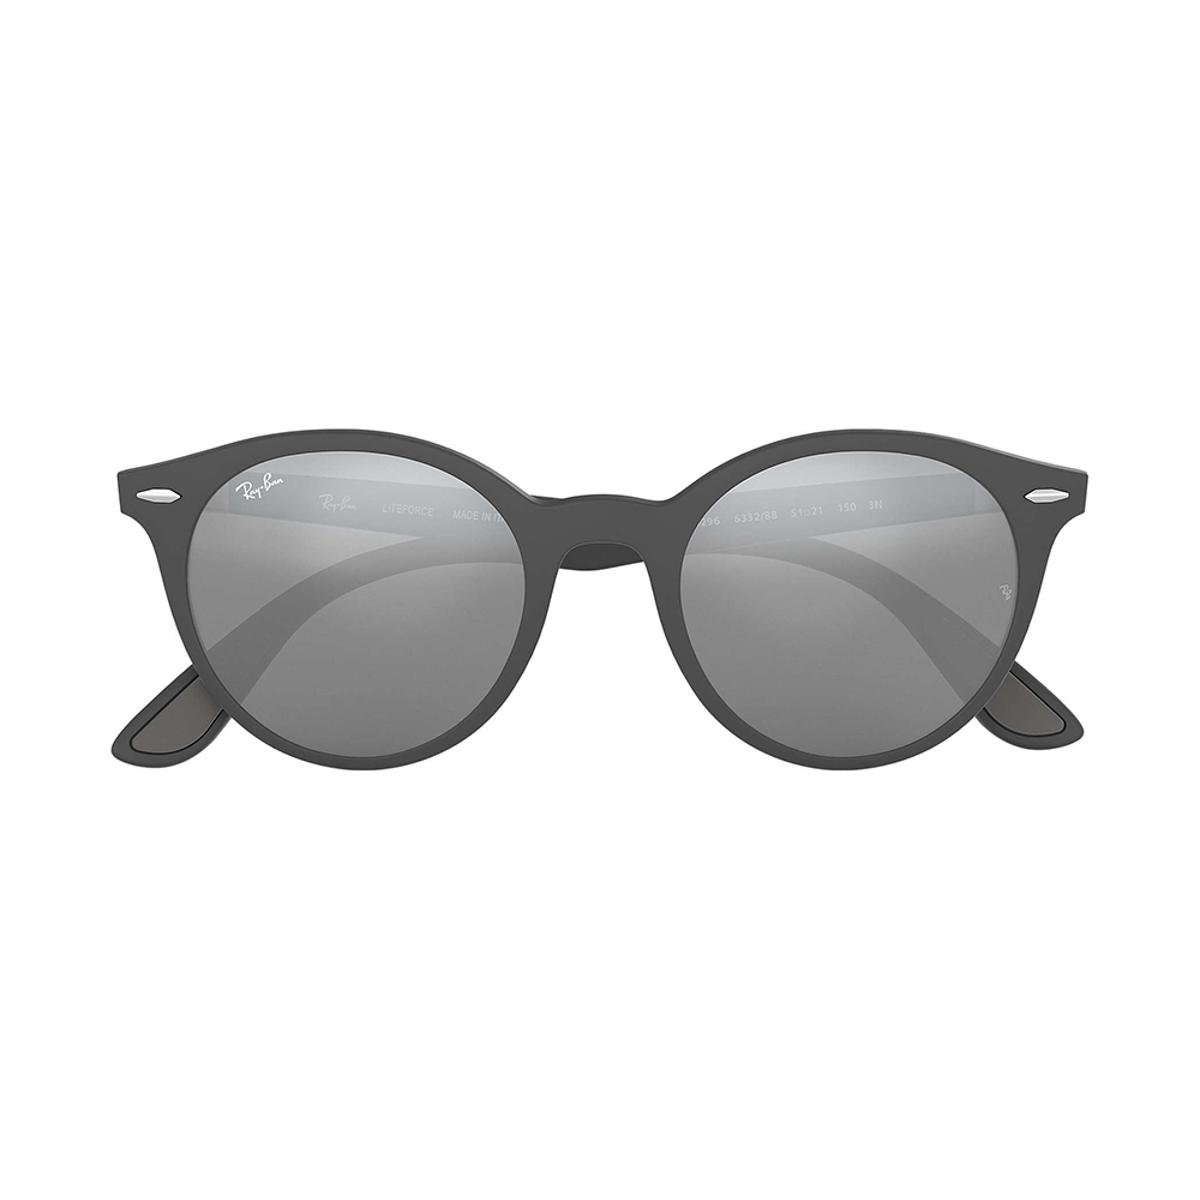 Óculos de Sol Ray-Ban RB4296 Feminino - Preto - Compre Agora   Netshoes cd27d9e988